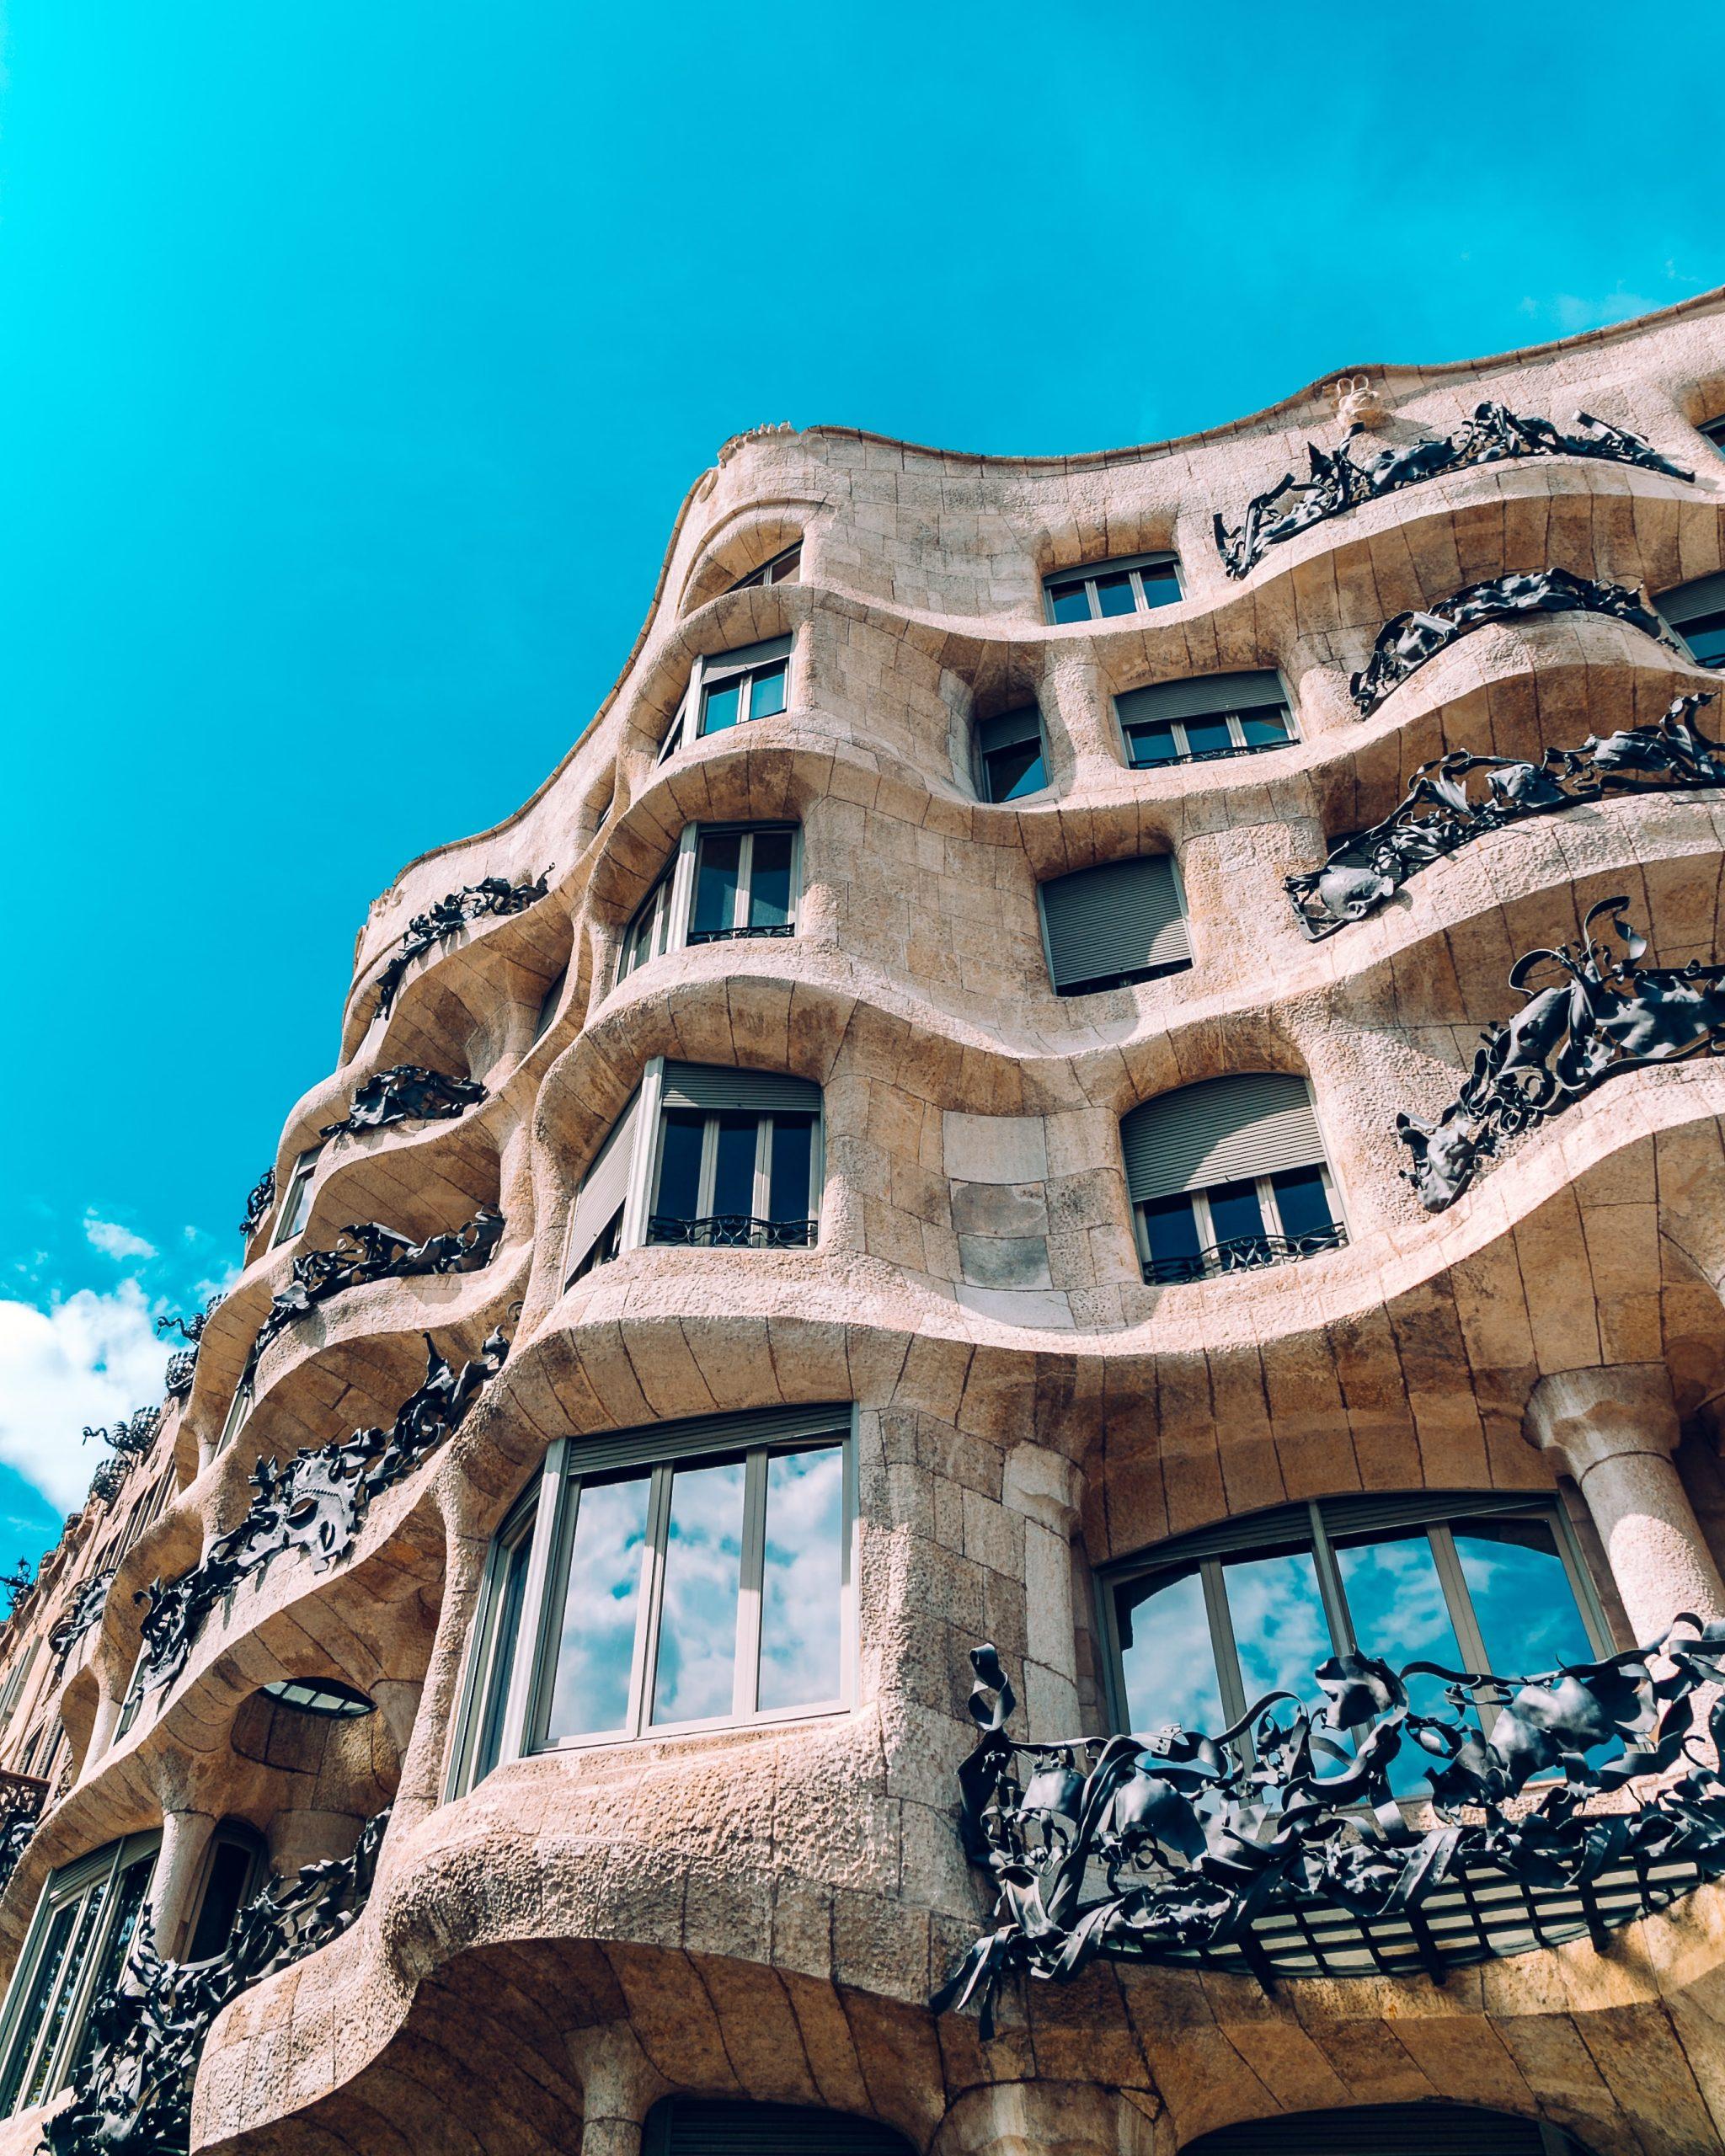 La Pedrera, Barcelona